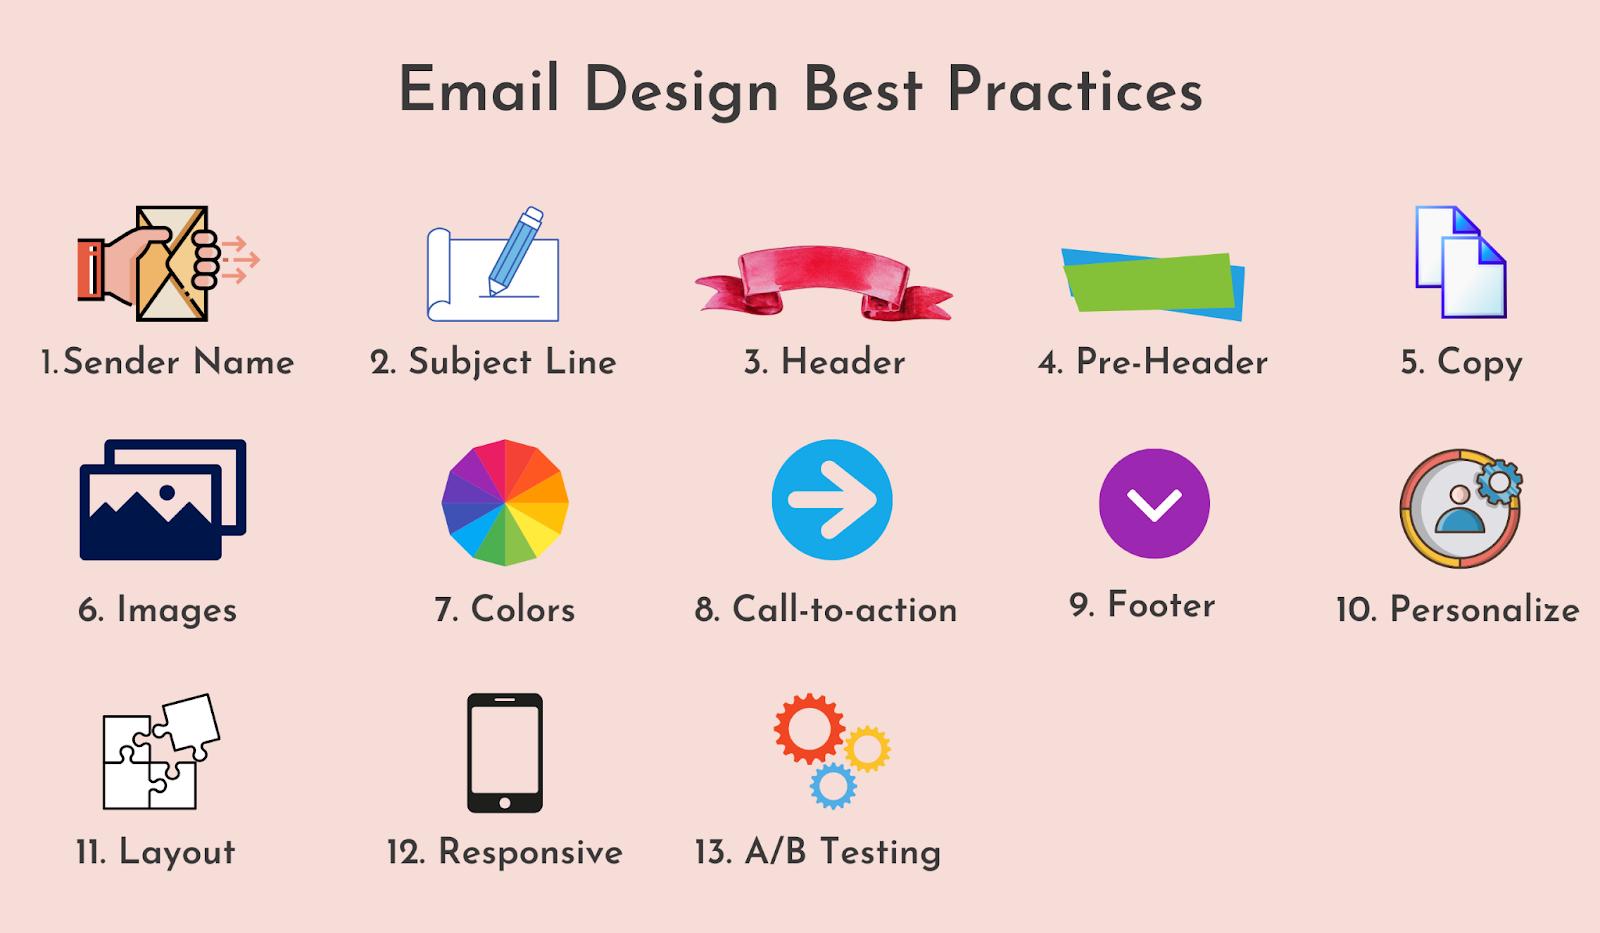 Email design best practices